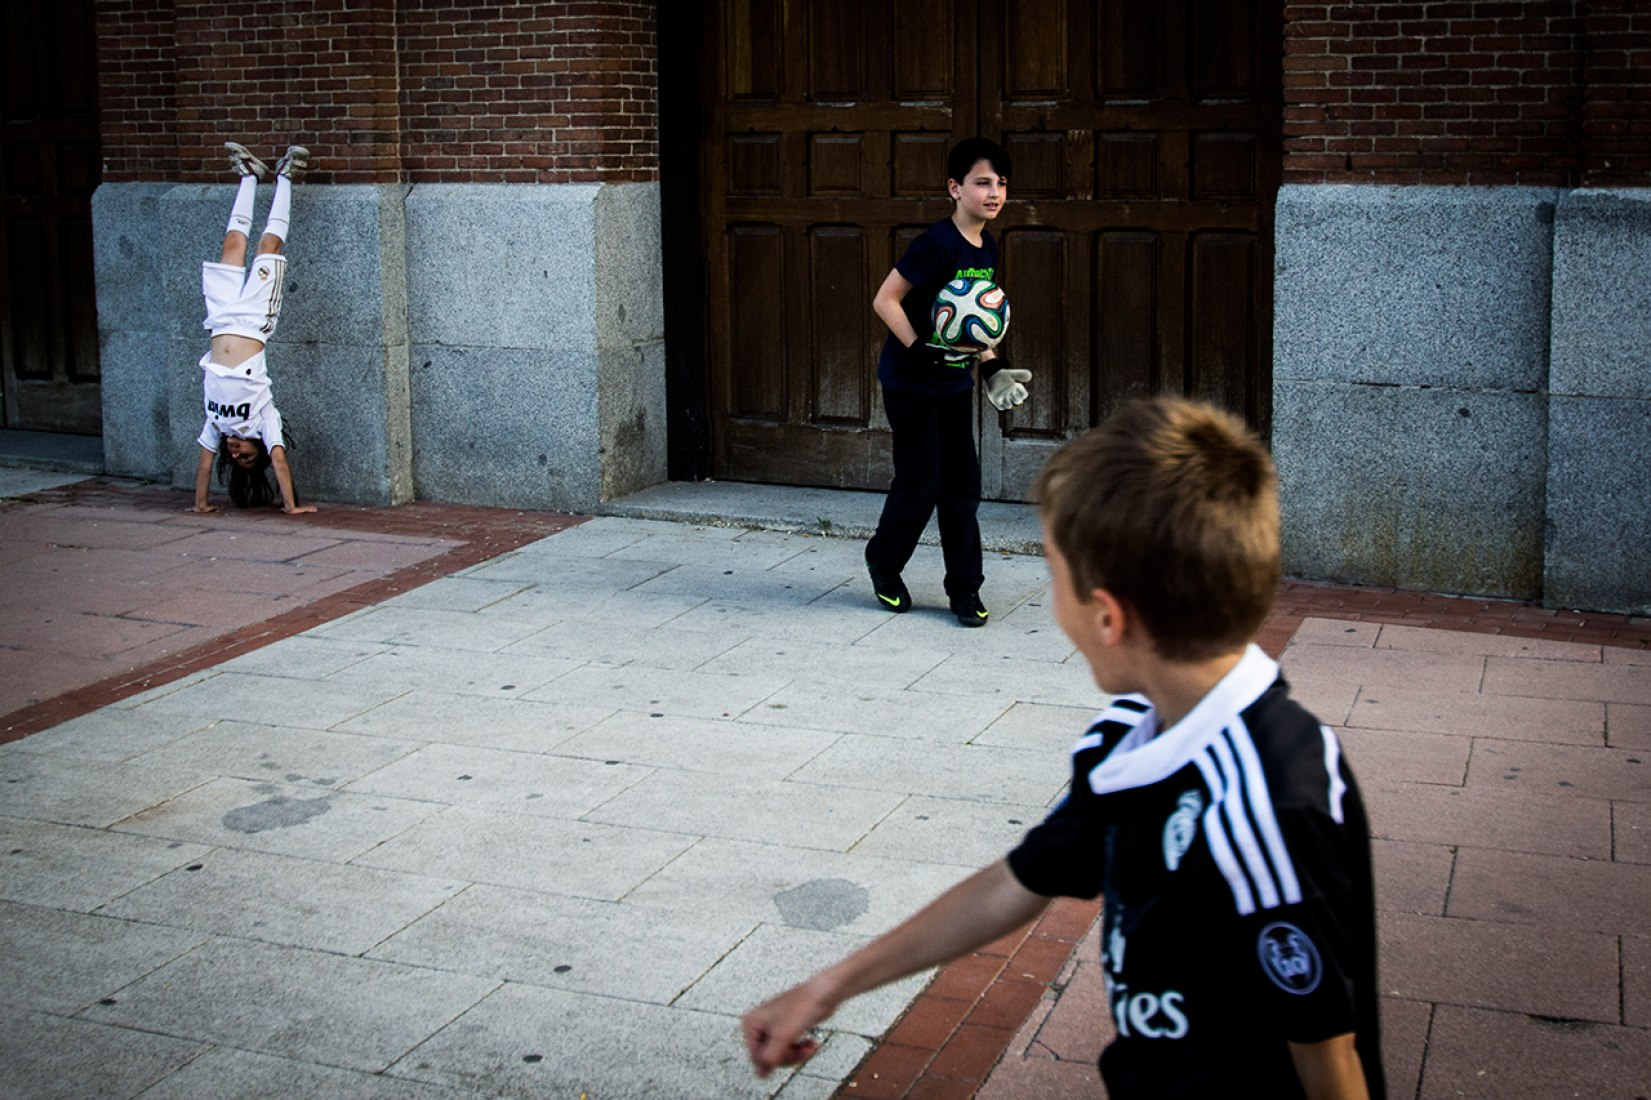 POPULAR VOTE AWARD. Charlie Cordero. 'Balón y malabares / Ball and Juggling'. 'Madrid 24h', photography exhibition at CentroCentro Cibeles. Courtesy of PHotoEspaña2015.